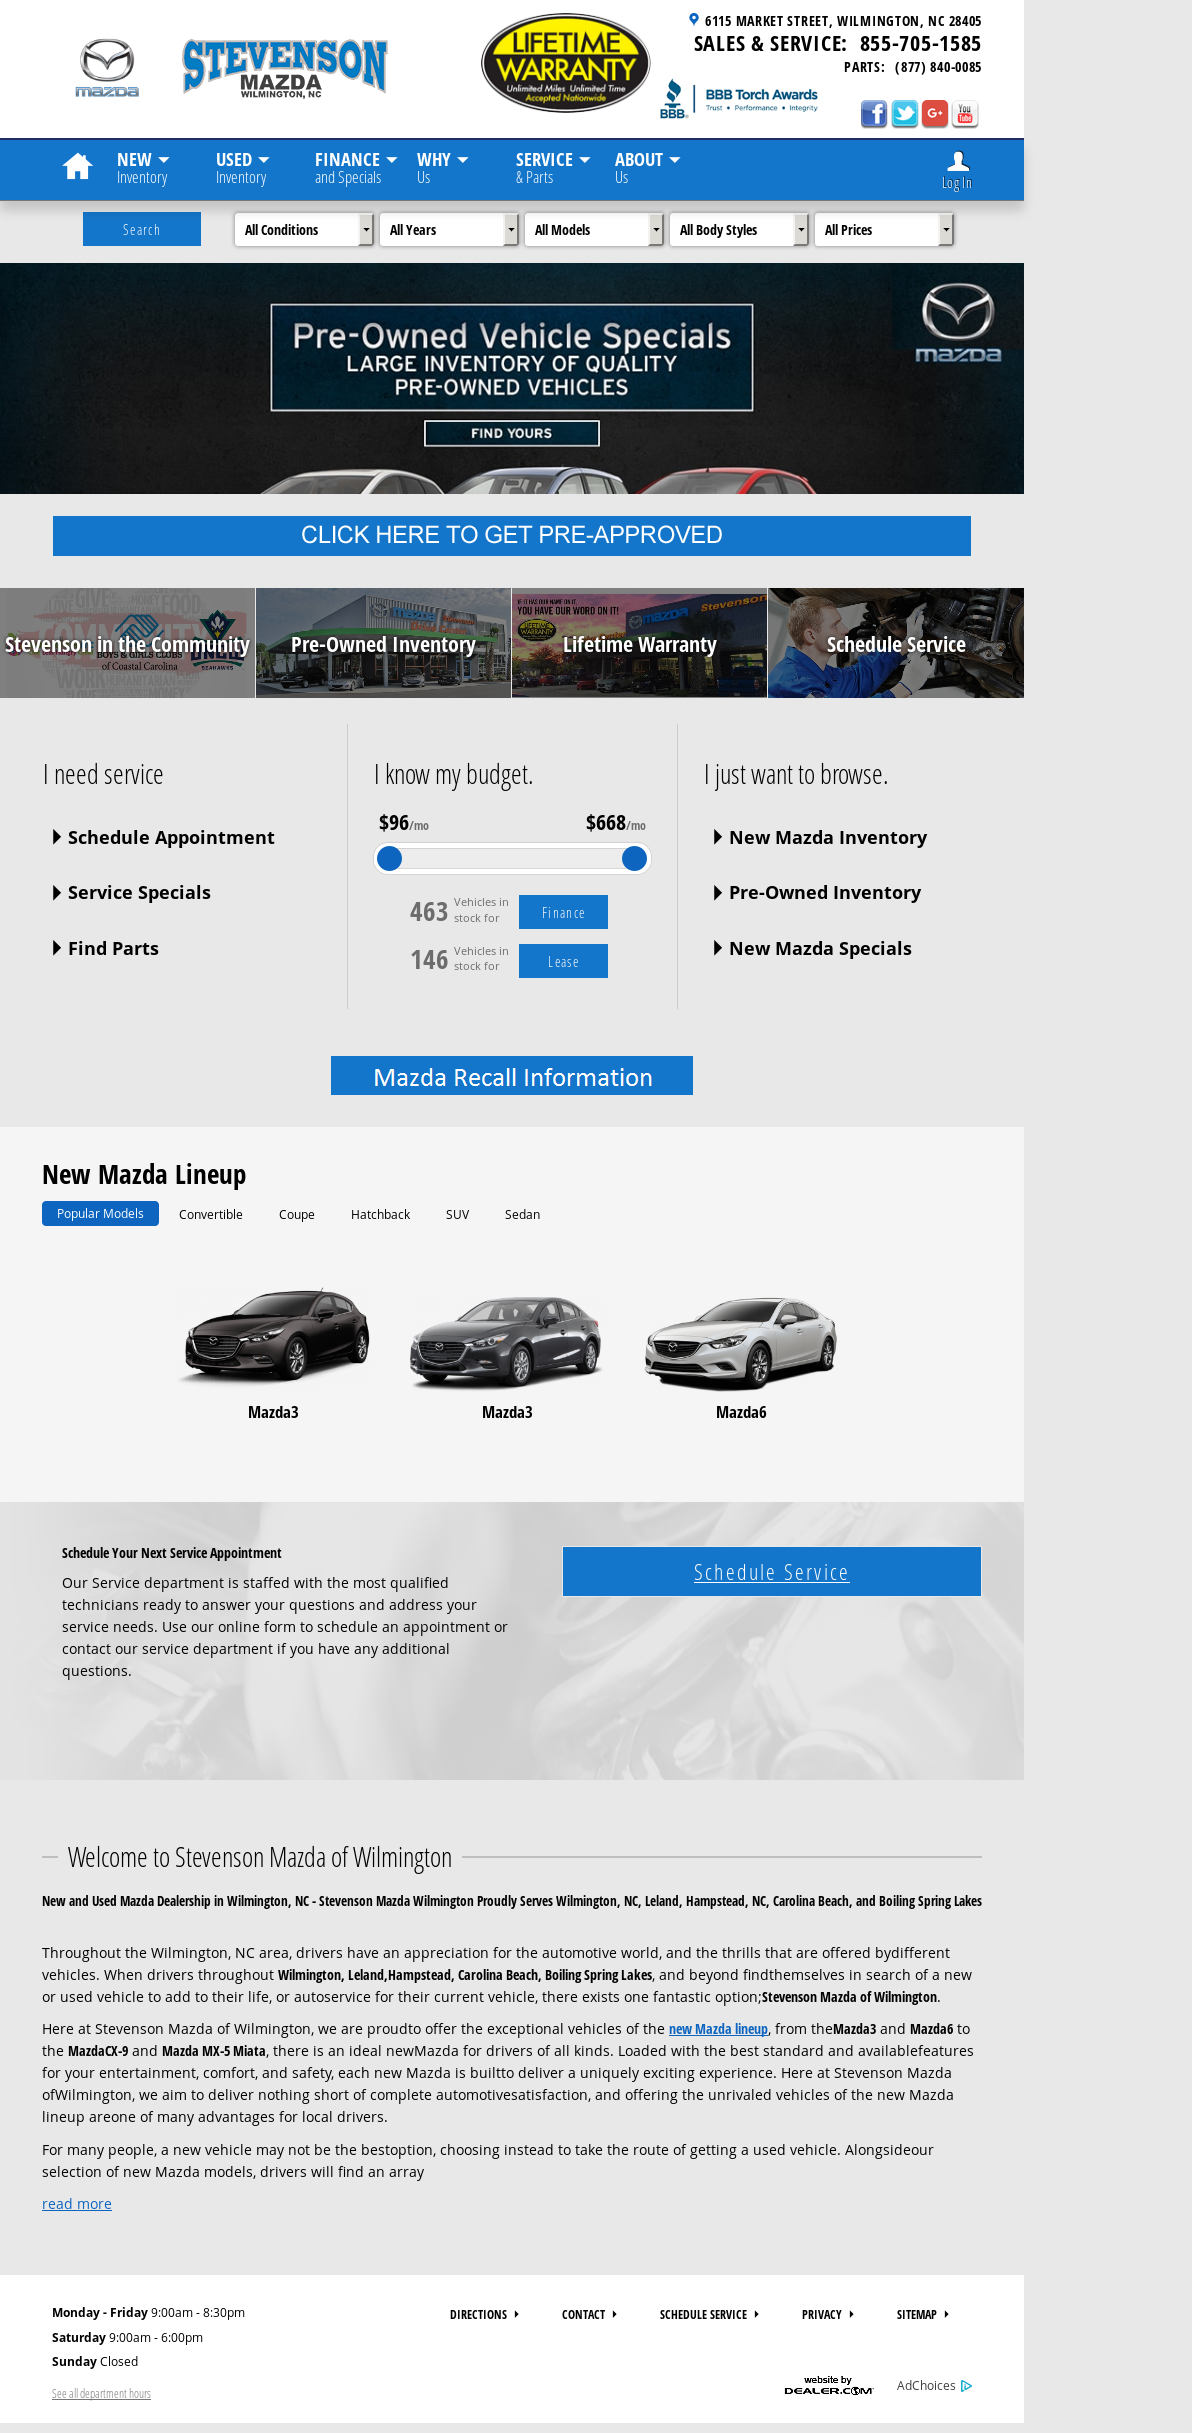 Stevenson Mazda Website History